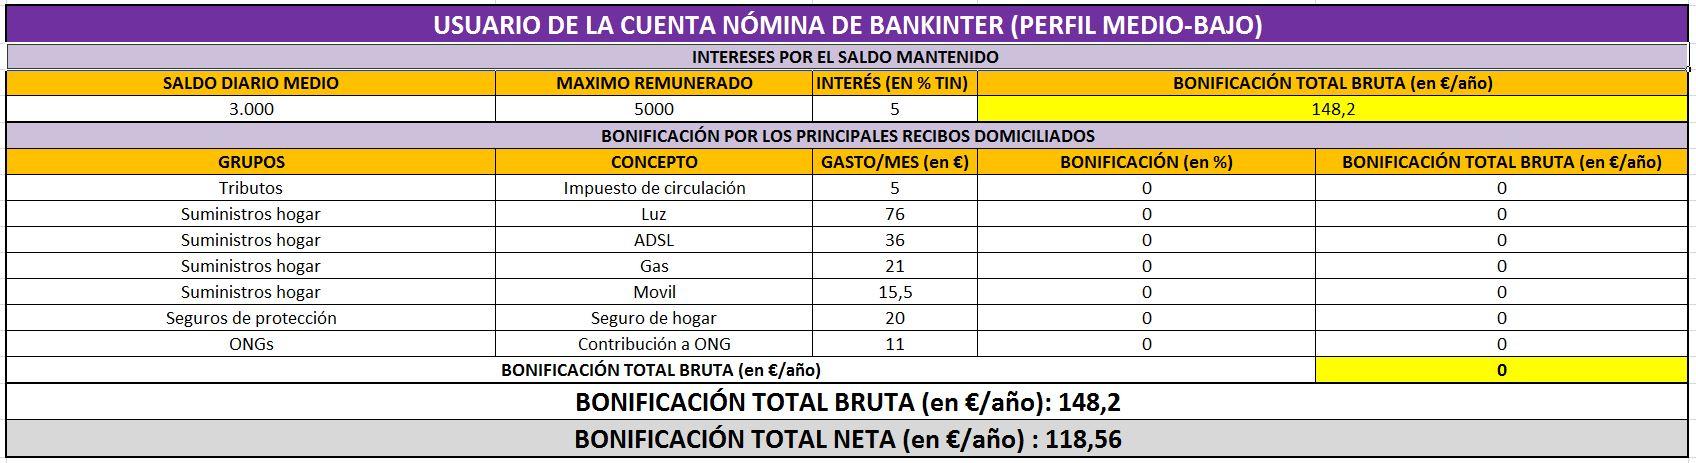 Bankinter%20perfil%20medio%20bajo